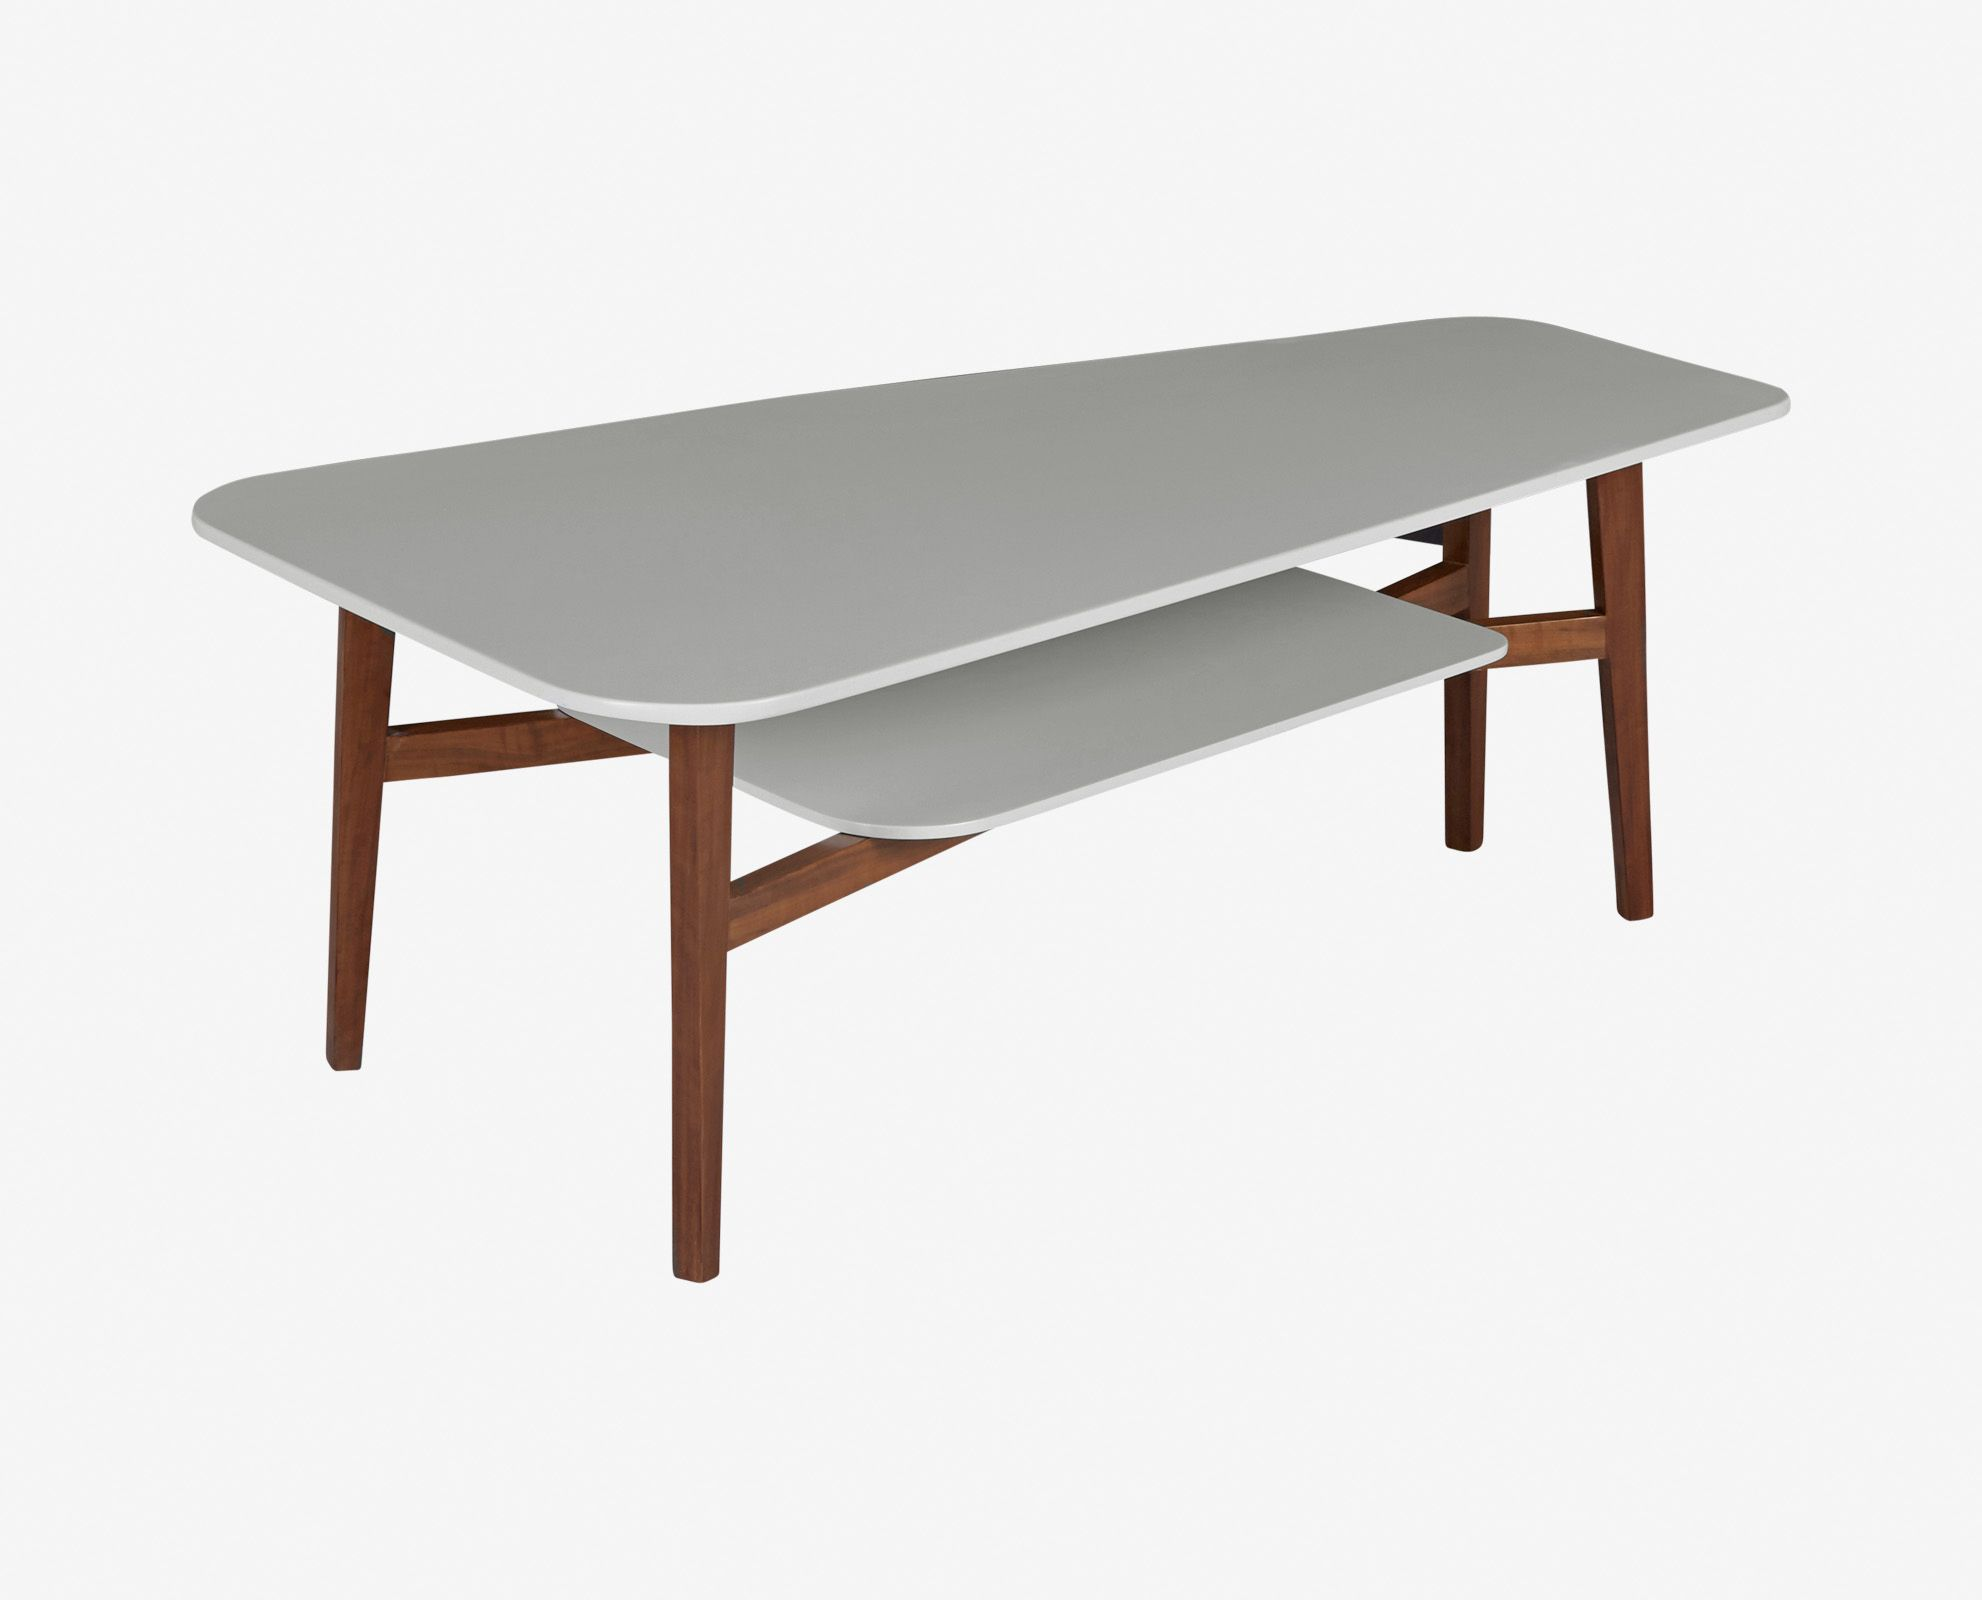 pinzhangpei on m木色  coffee table table unique